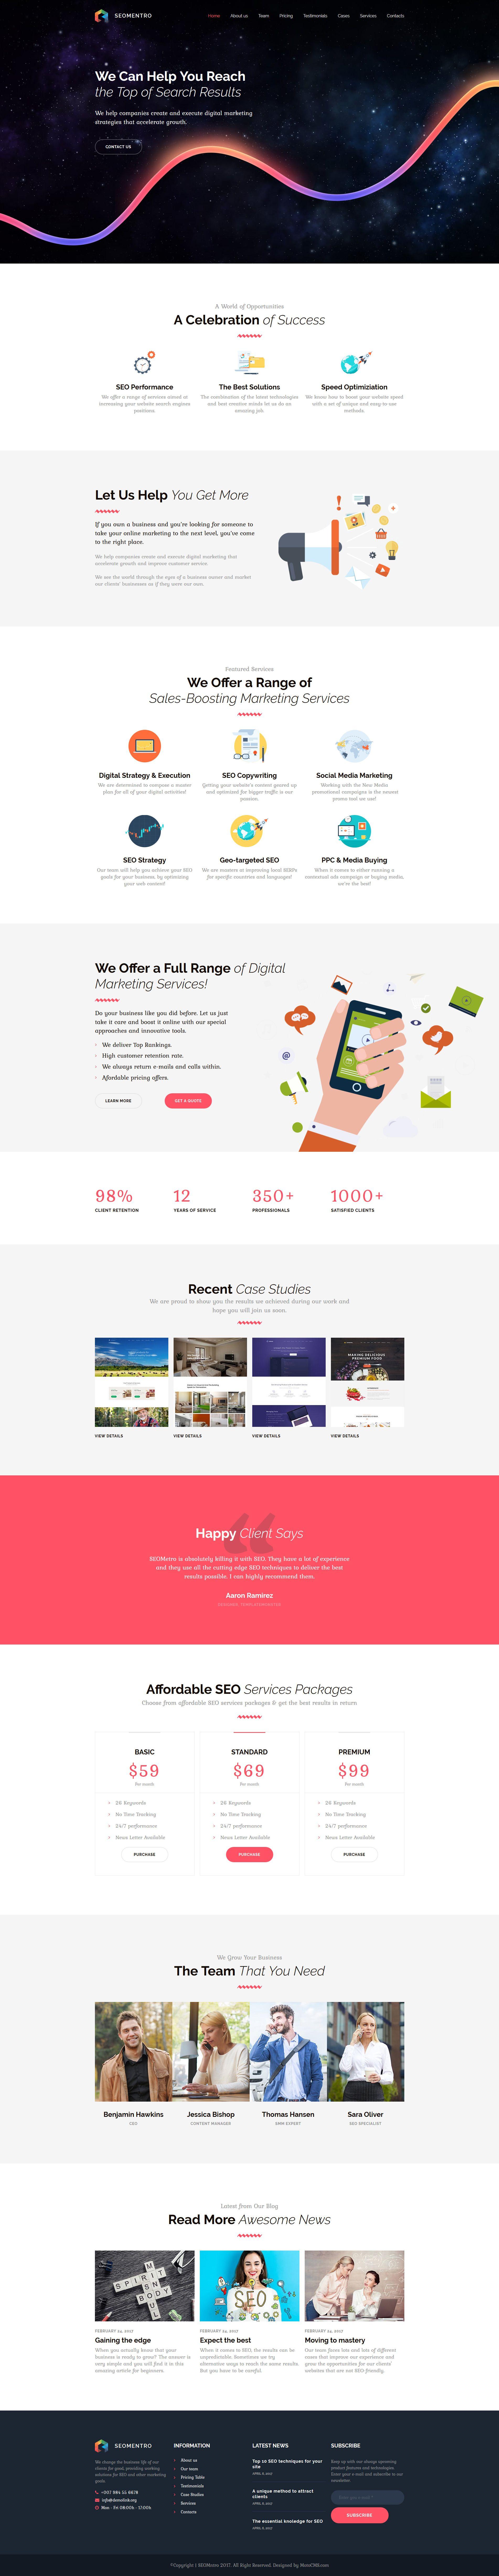 Seomentro - SEO & Digital Marketing Agency Moto CMS 3 Template | Seo ...